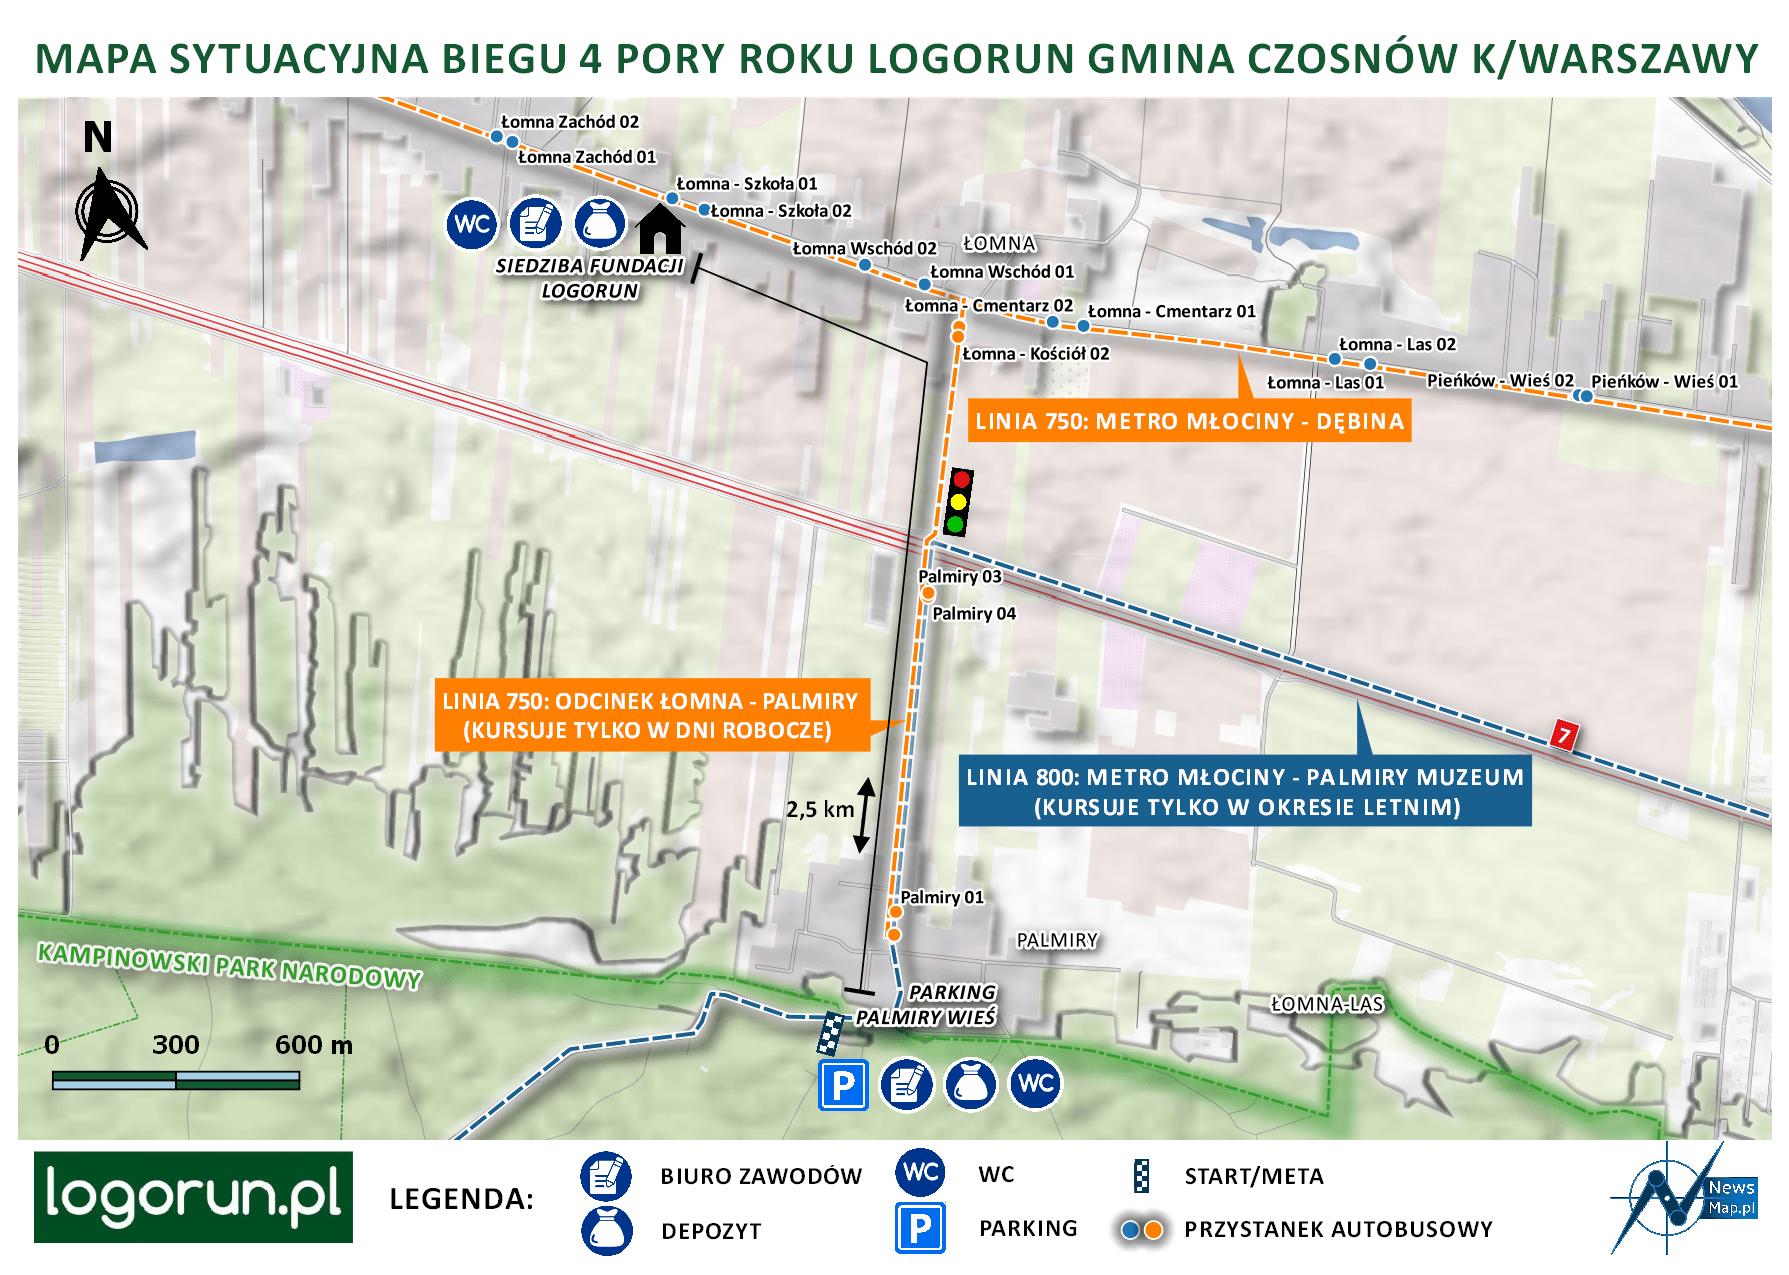 Mapa sytuacyjna LogoRun Palmiry (on-line)